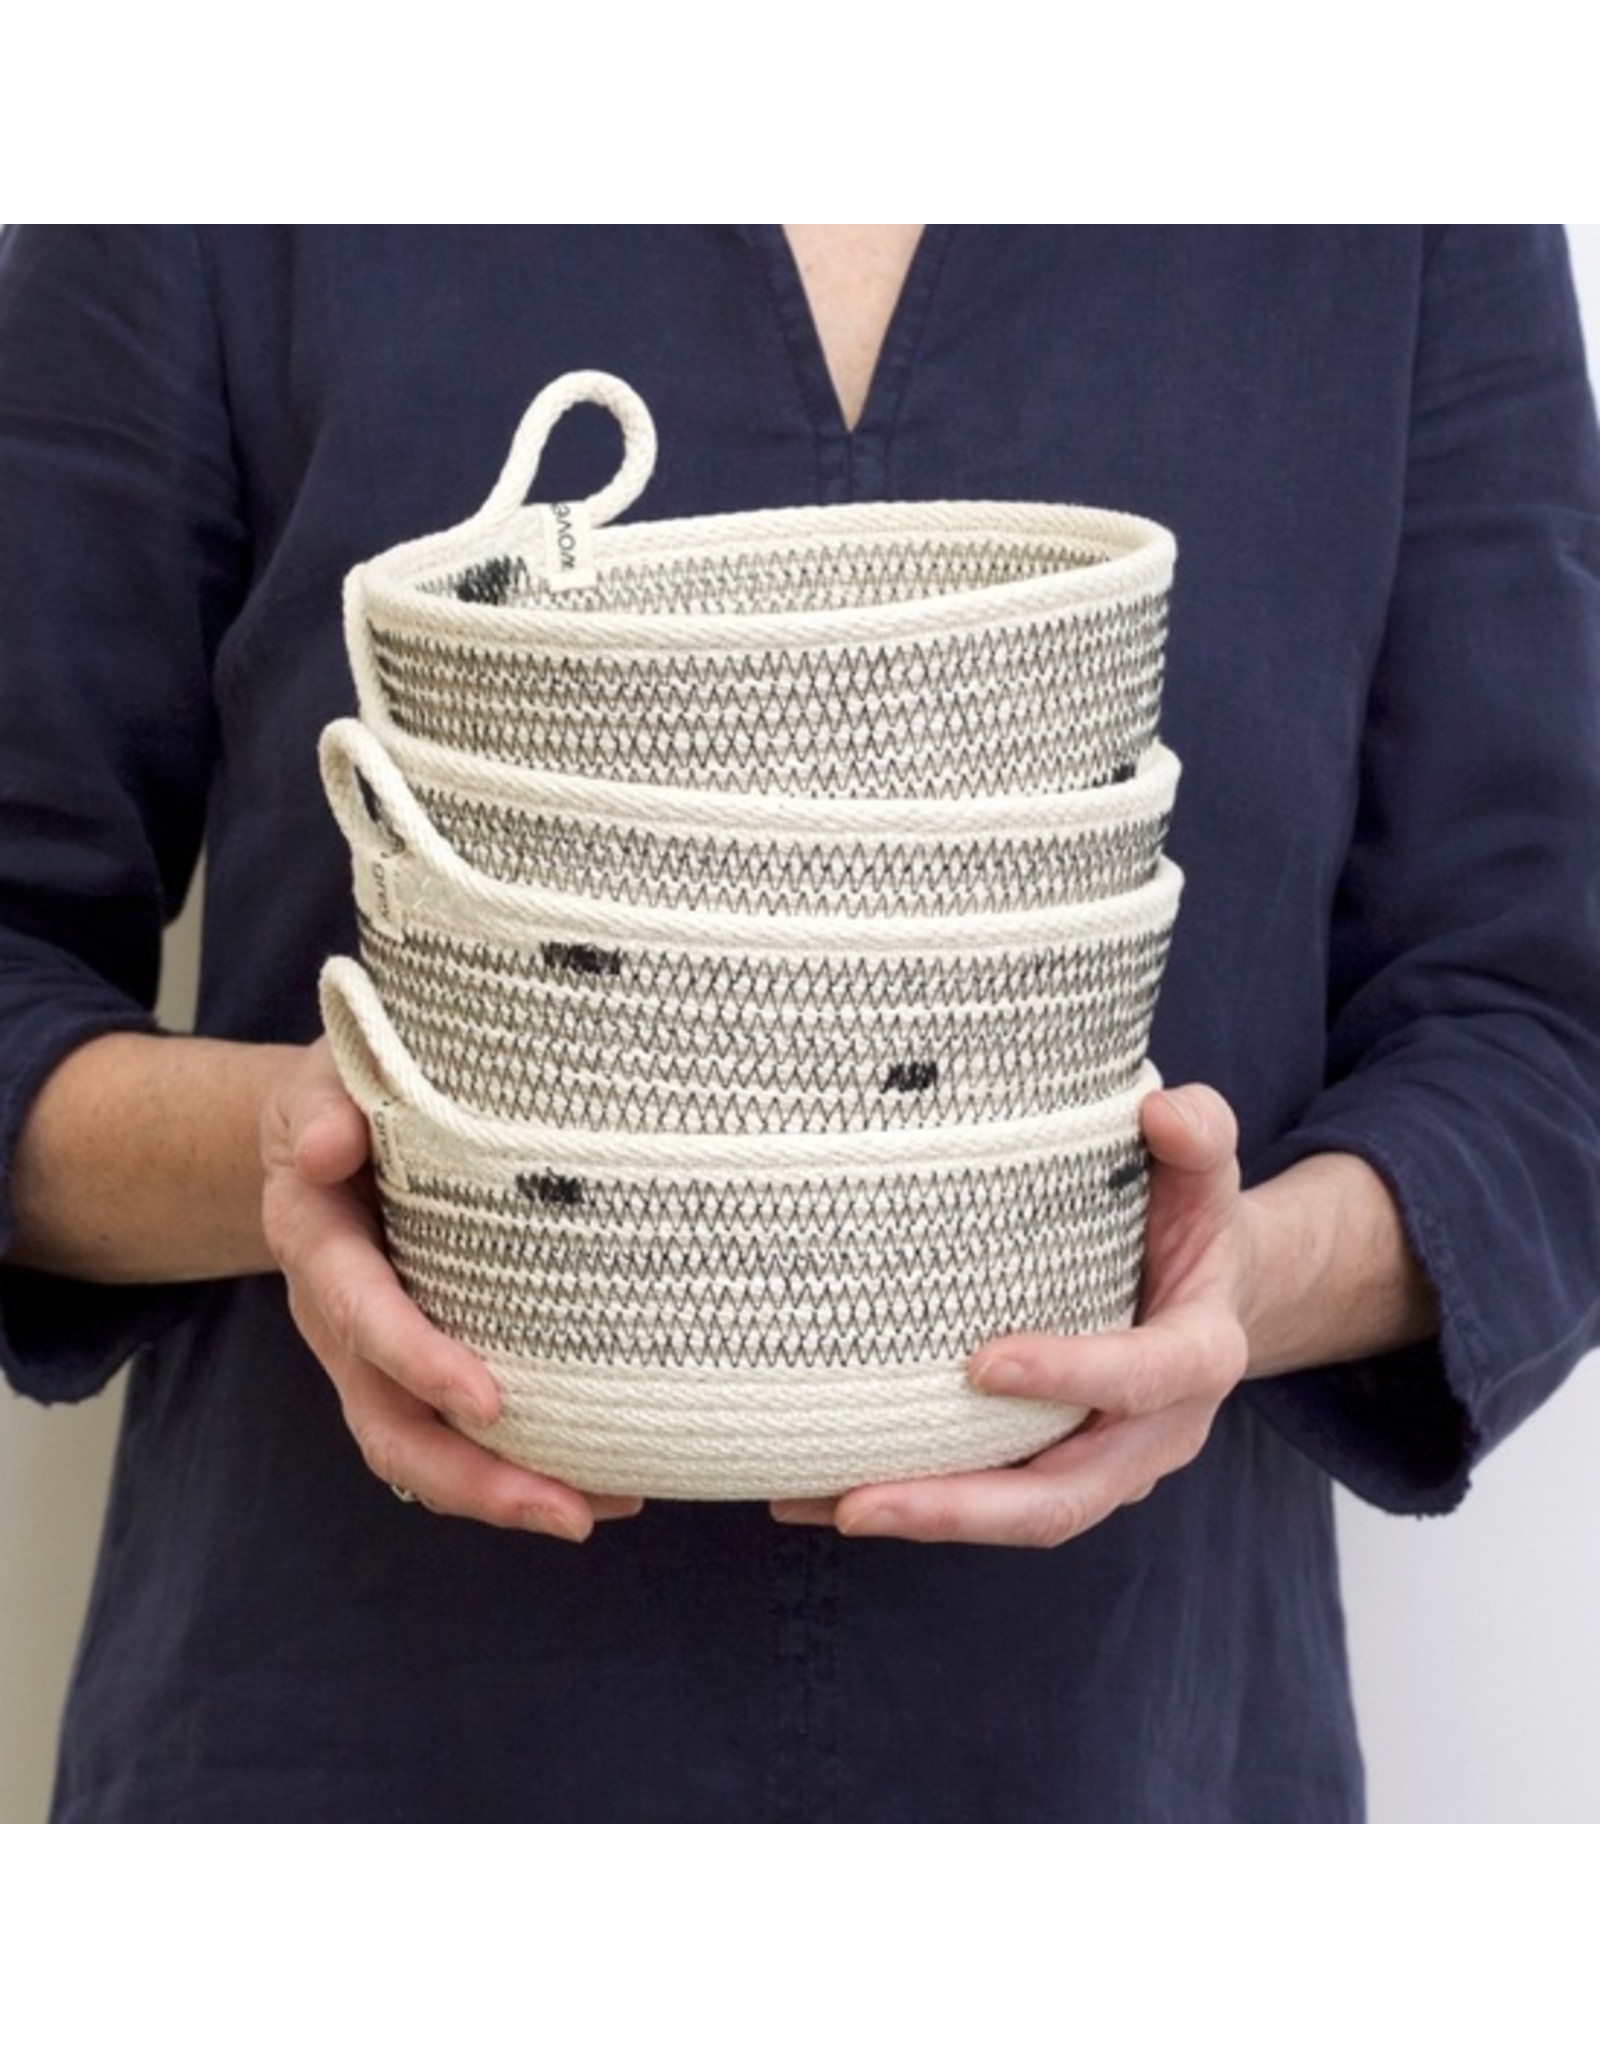 Woven Grey Striped Woven Bowl - Small